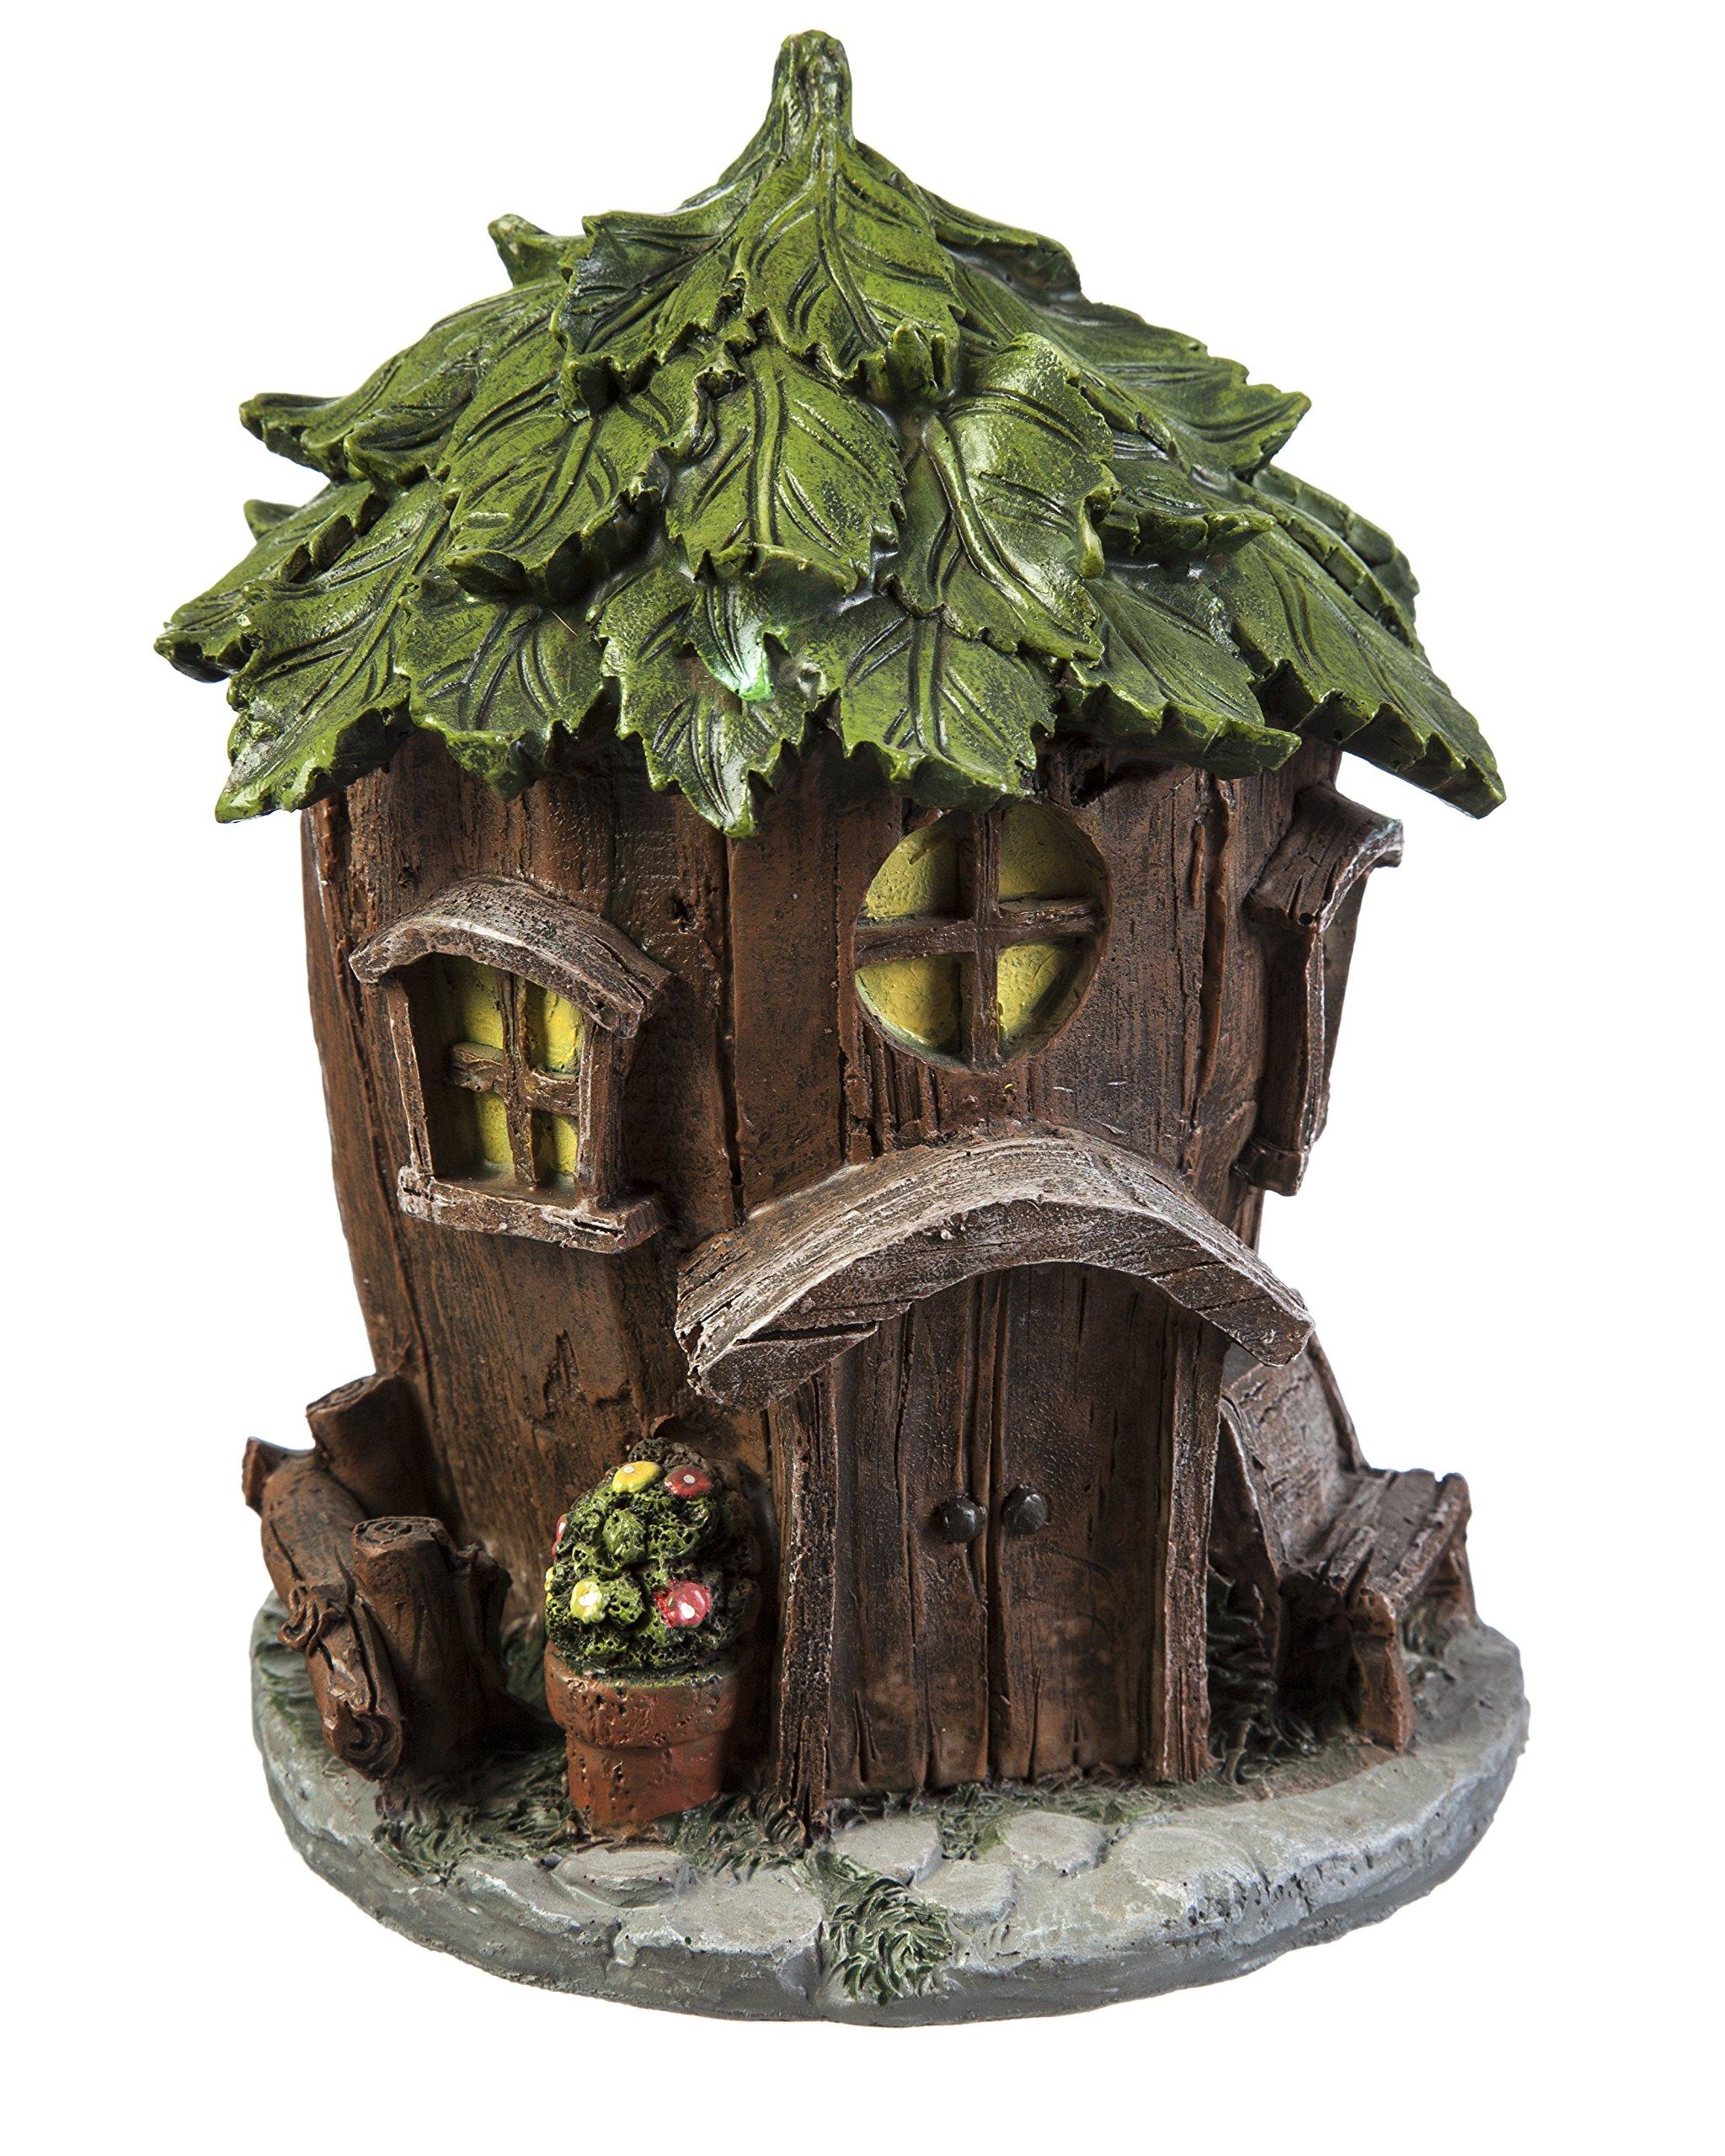 Evergreen Garden New Creative Outdoor-Safe Mini Garden Polystone Fairy Houses, Set of 4-5.5'' W x 5.75'' D x 6.75'' H by New Creative (Image #1)